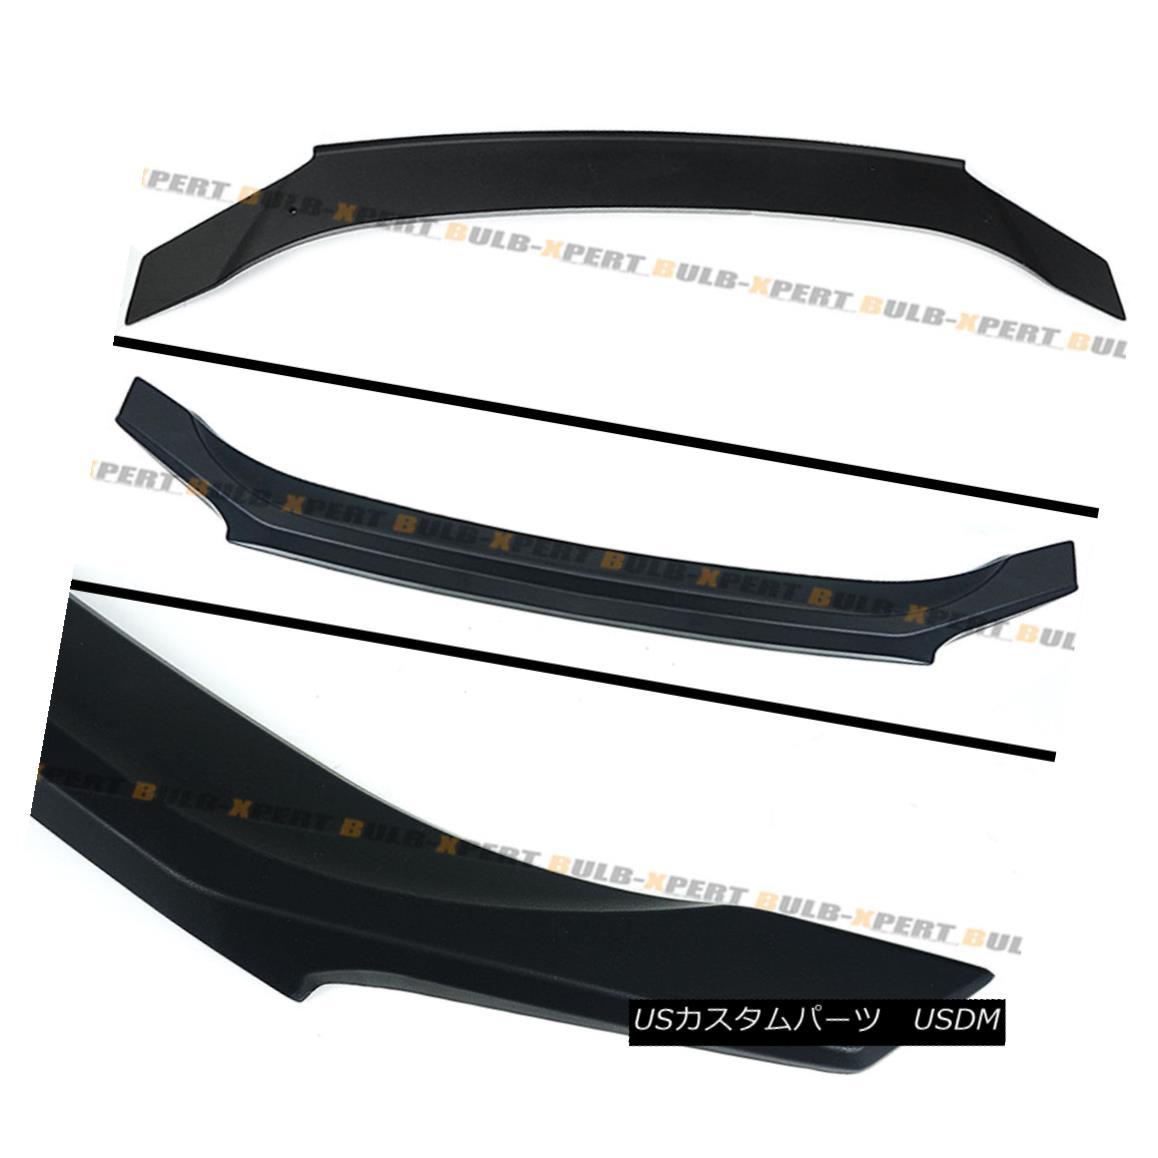 Trunk lip Spoiler Combo For 06-12 IS250 IS350 Unpainted Rear Window Roof Wing